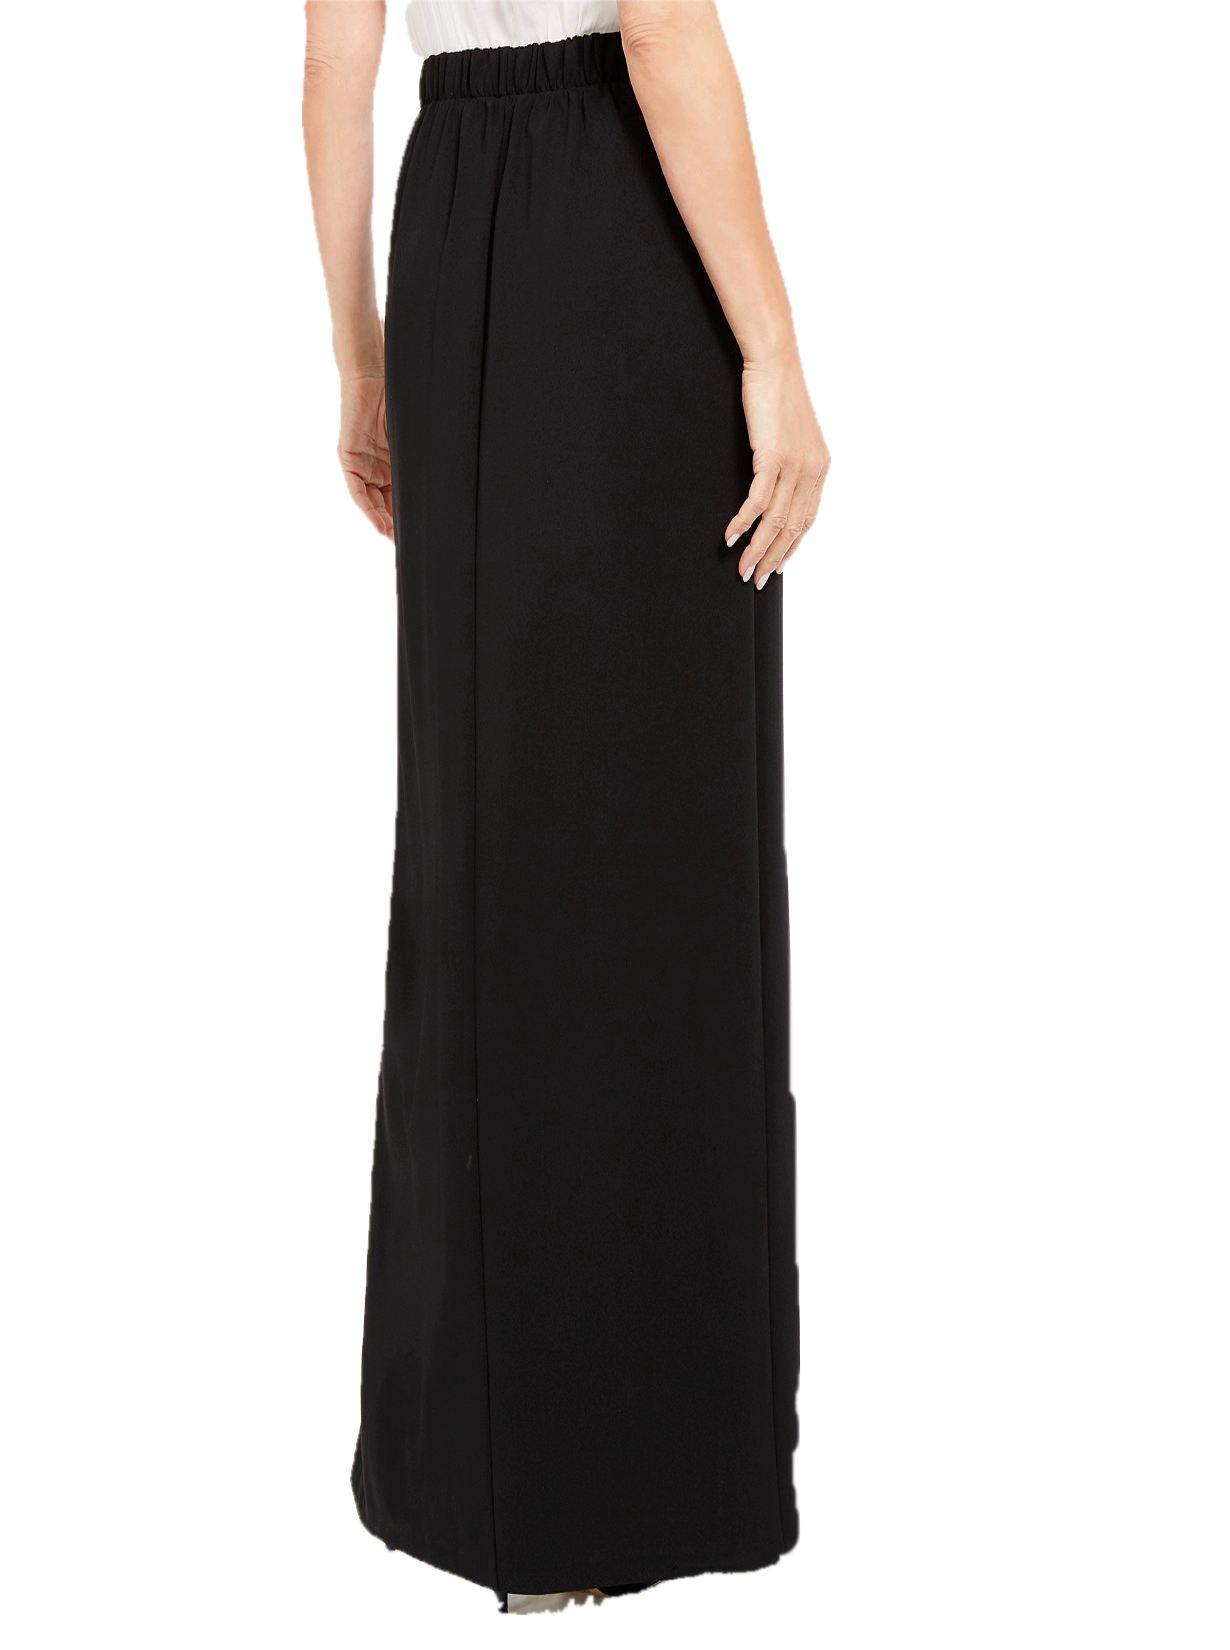 Ankle Length Side Slit Pencil Skirt in Black